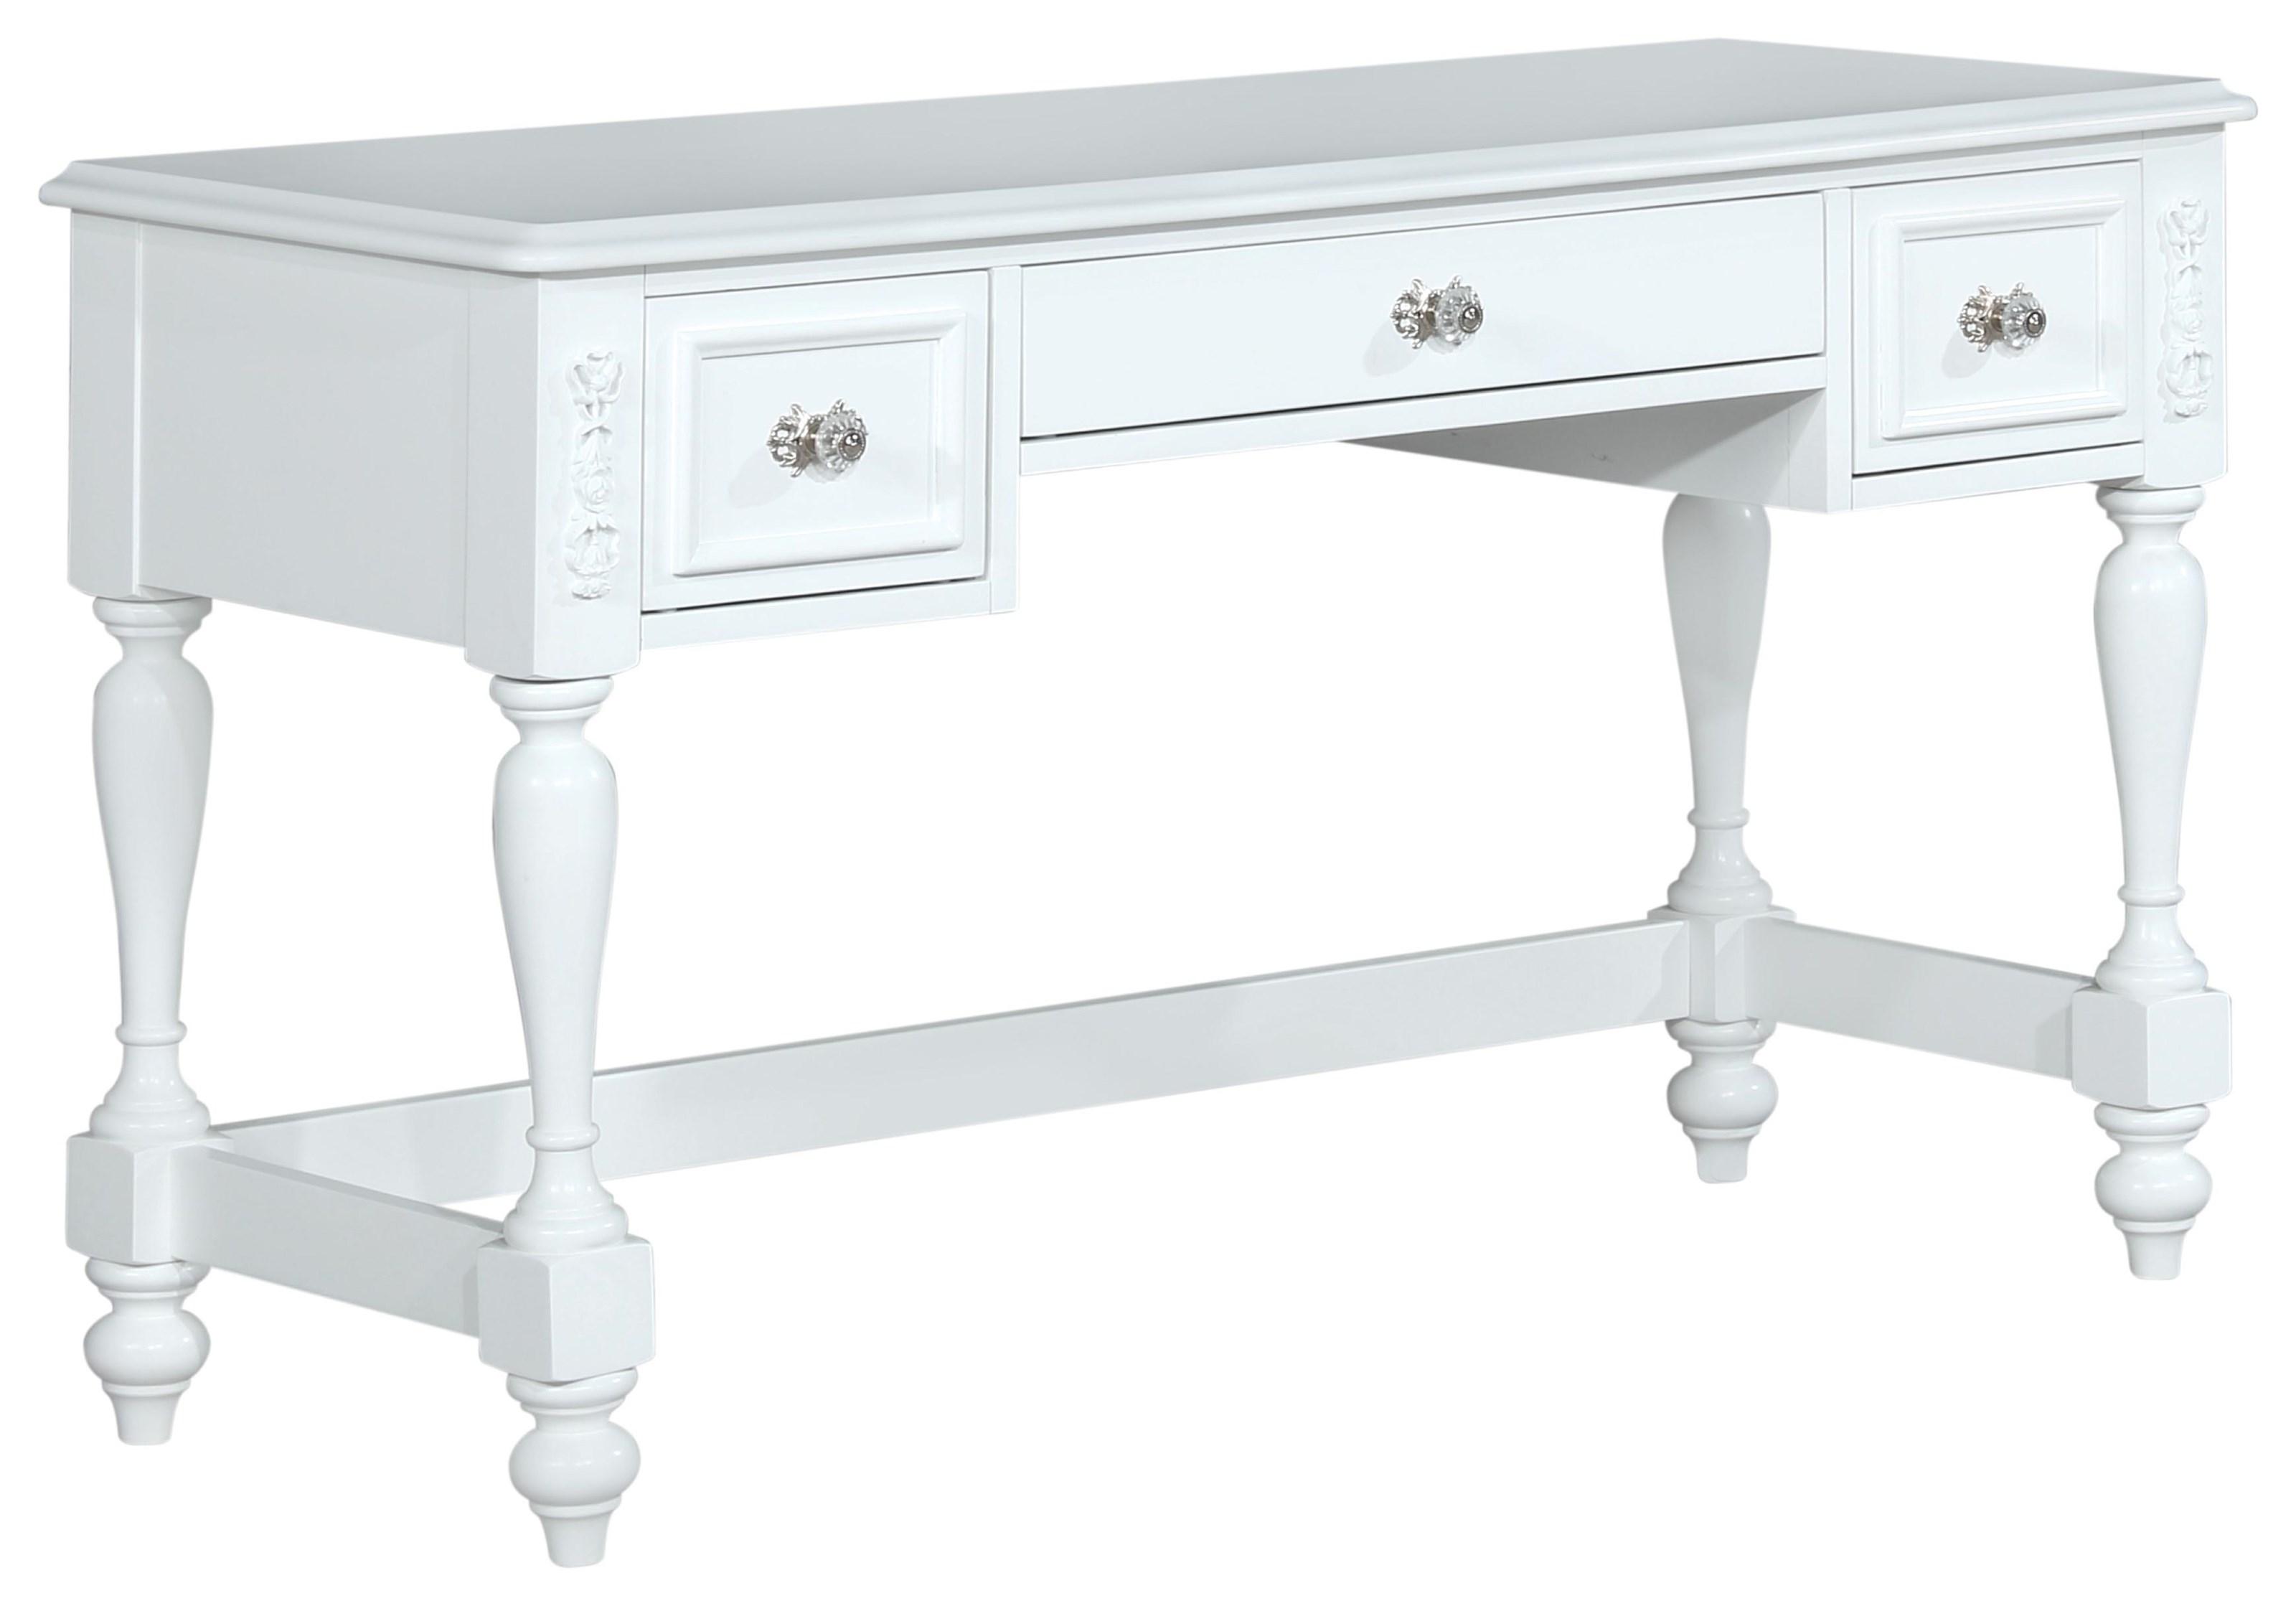 8446A Three Drawer Desk by Lifestyle at Furniture Fair - North Carolina